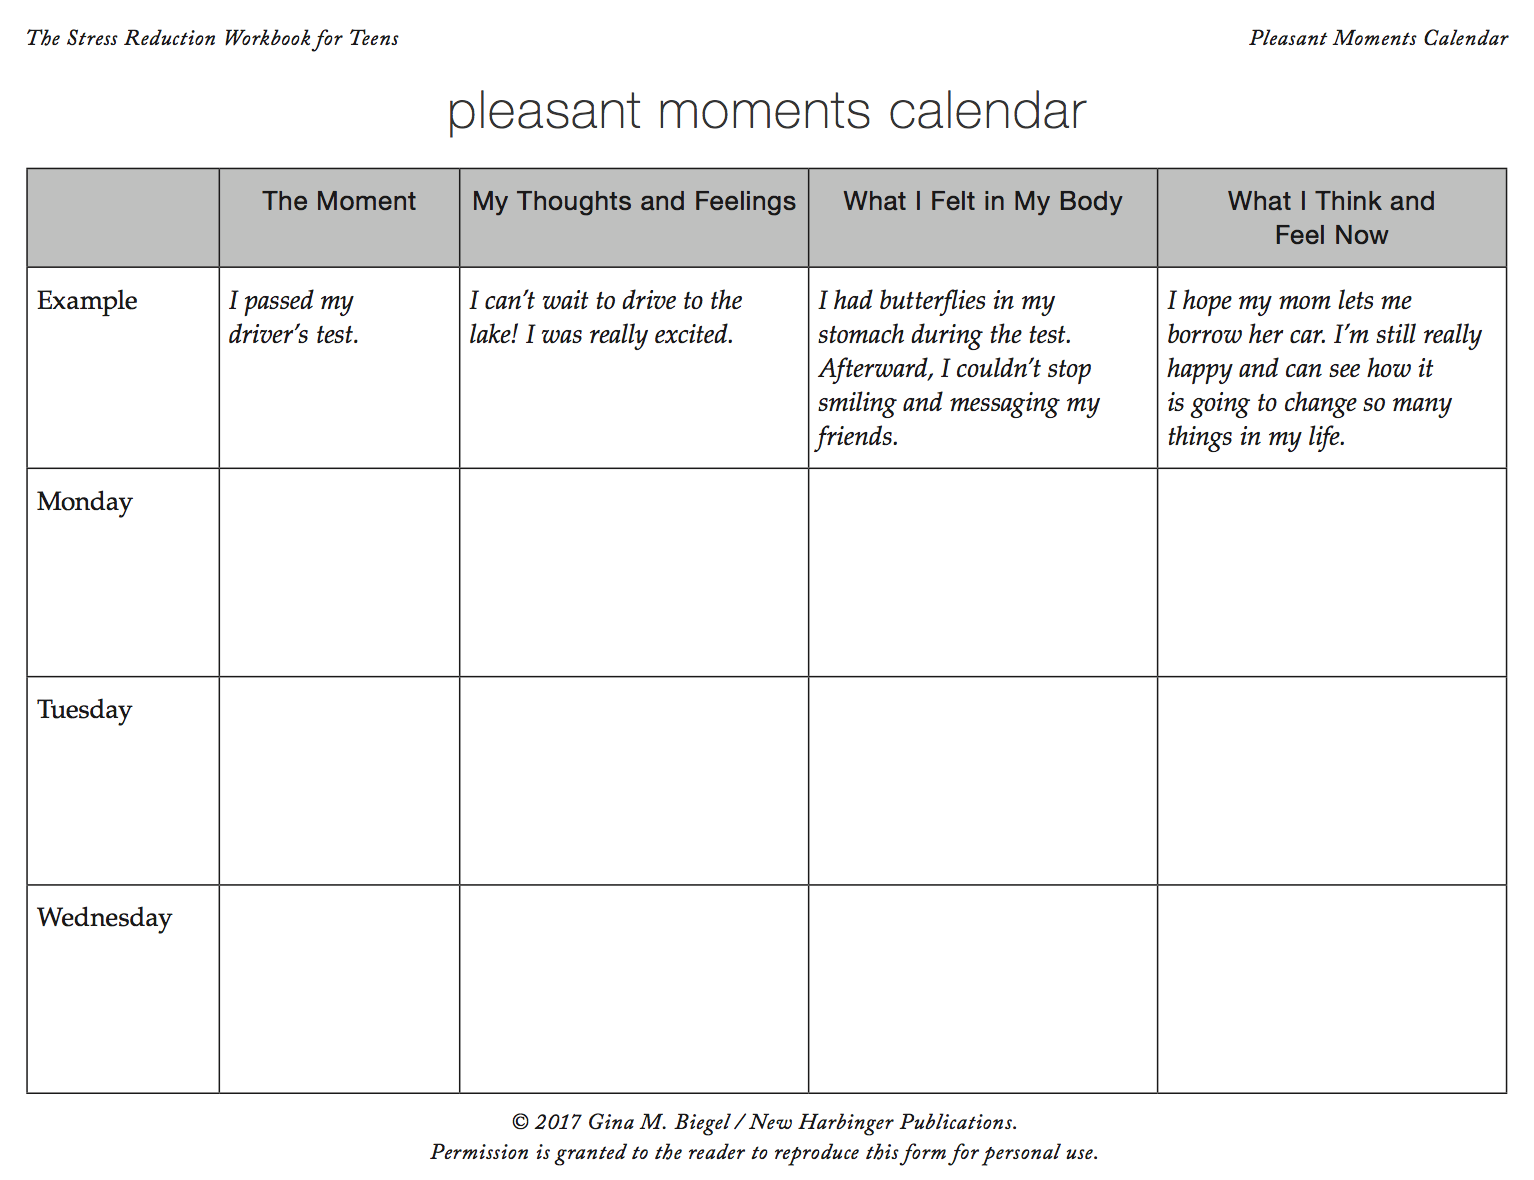 pleasantScreen Shot 2018-04-10 at 3.50.21 PM.png